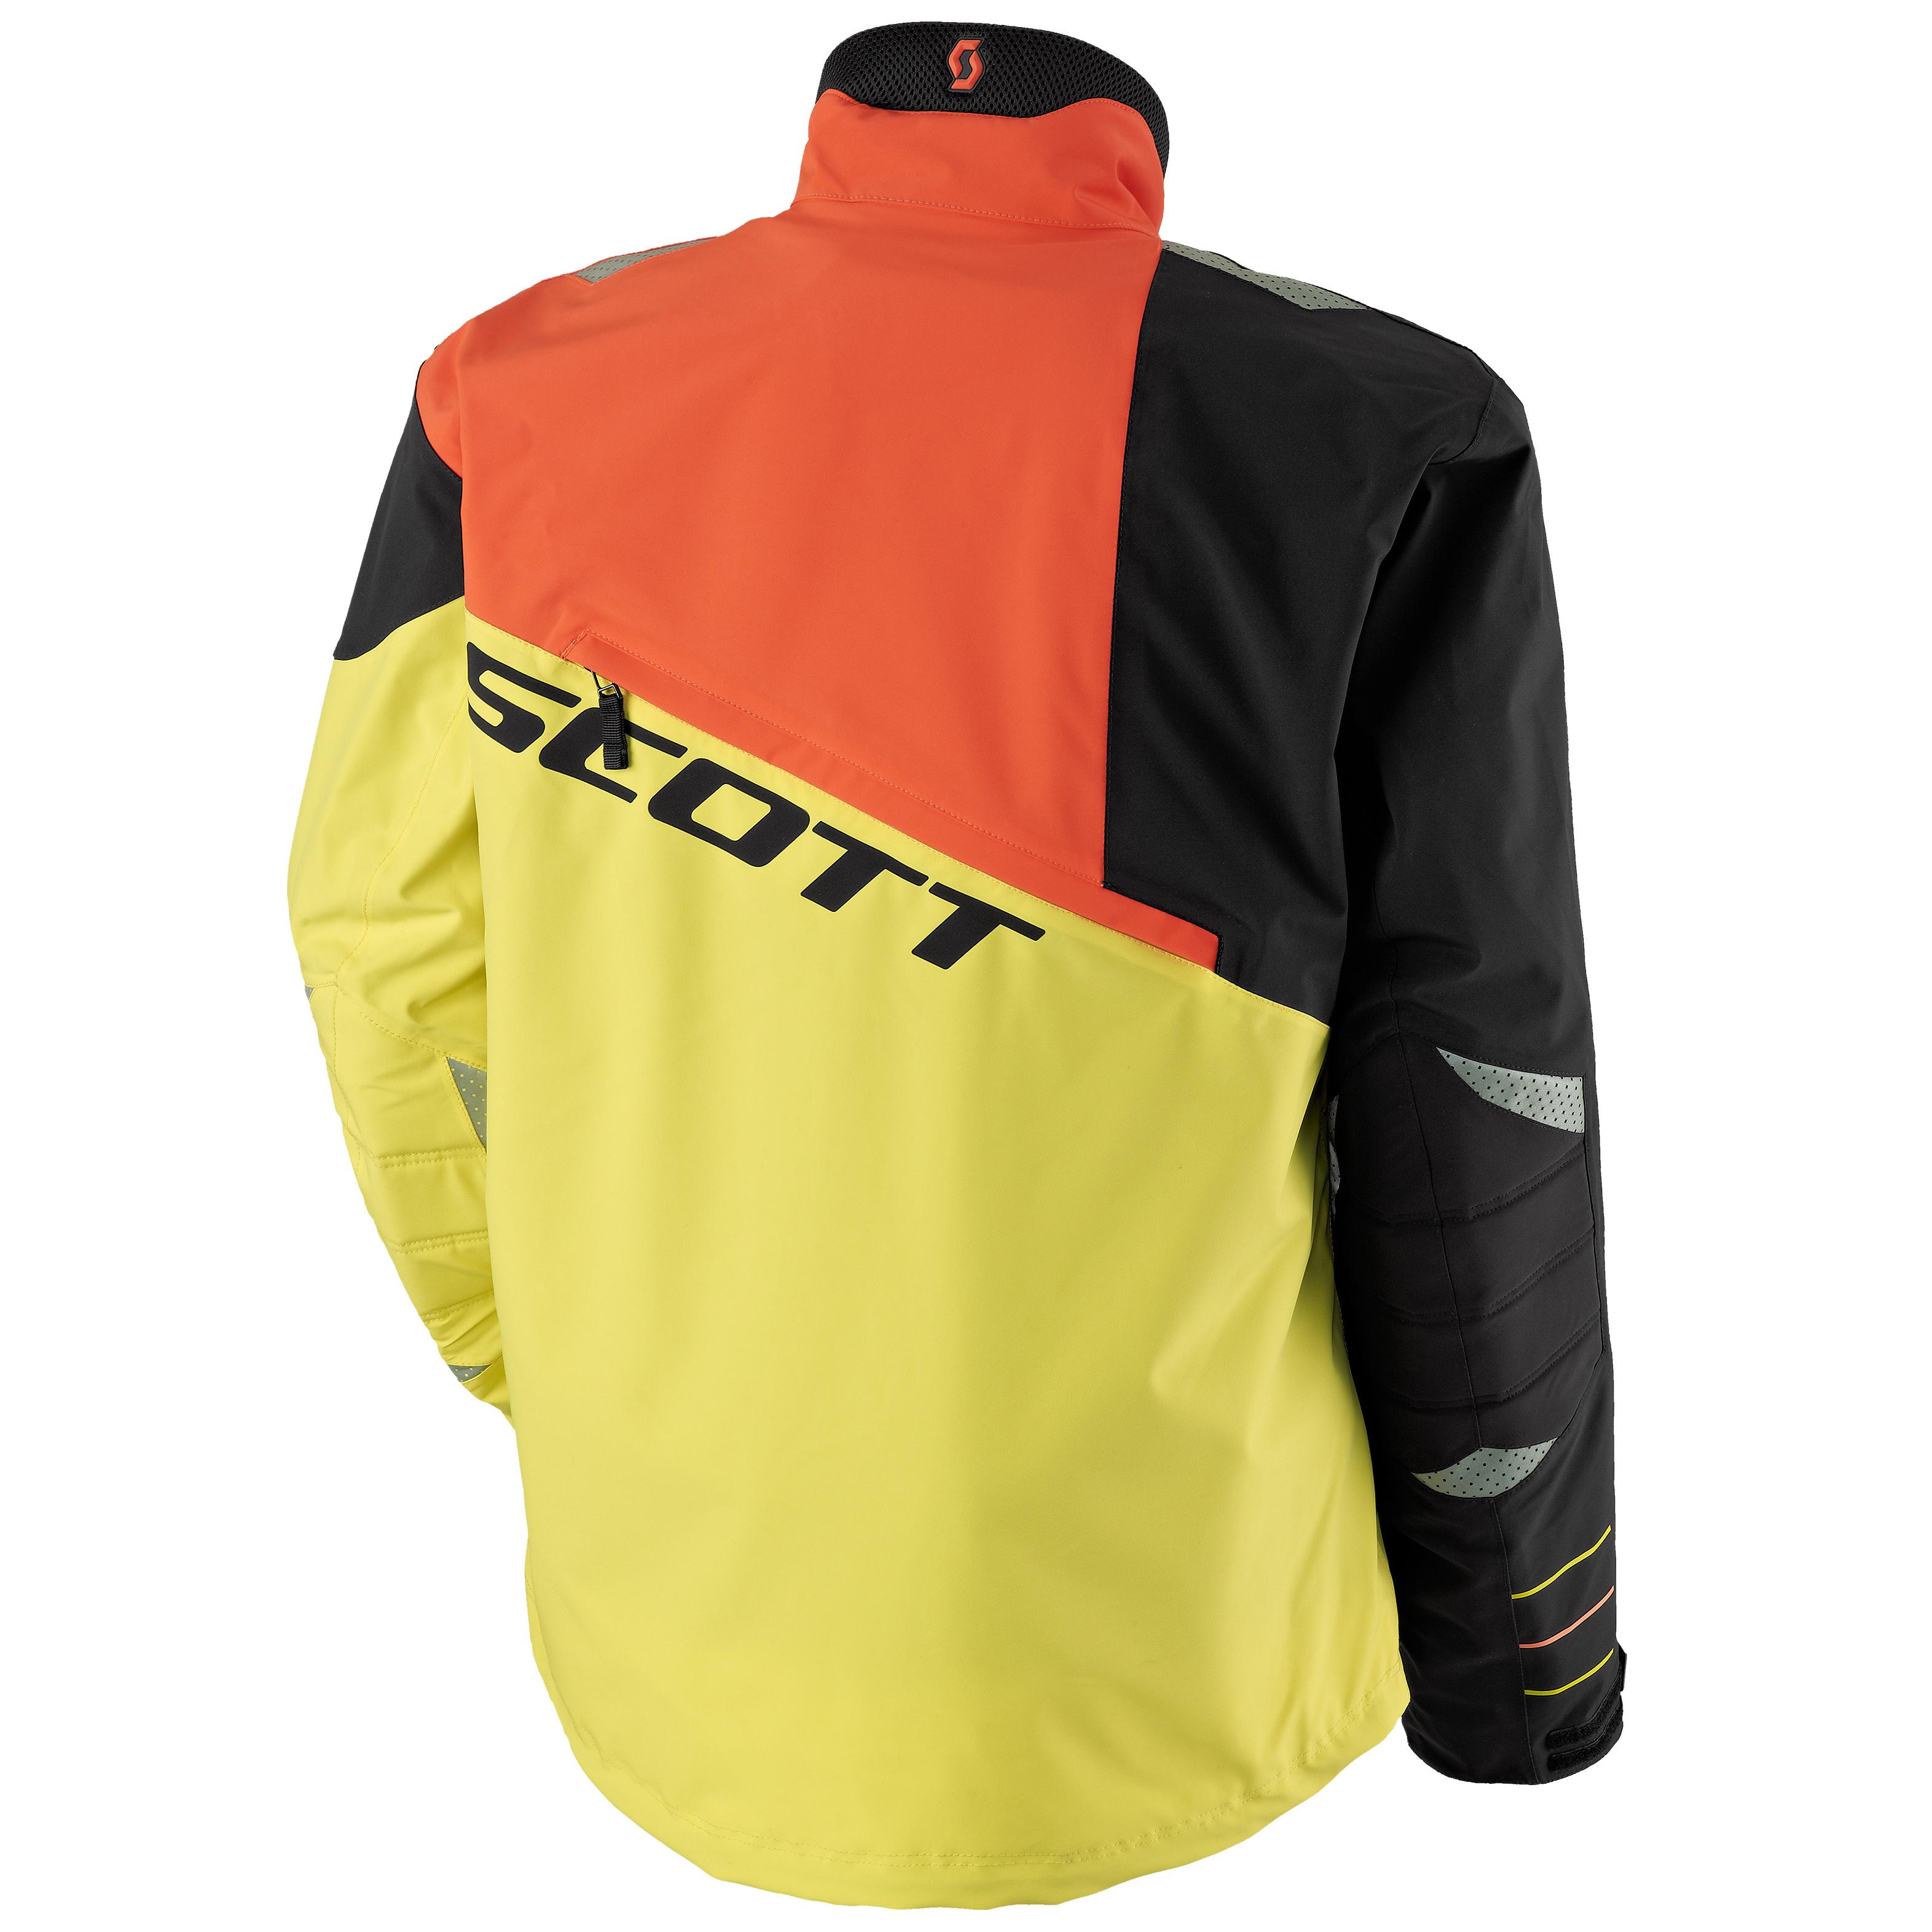 Scott Takki Comp Pro Shell neonkeltainen musta S 311 f122a7b3fe